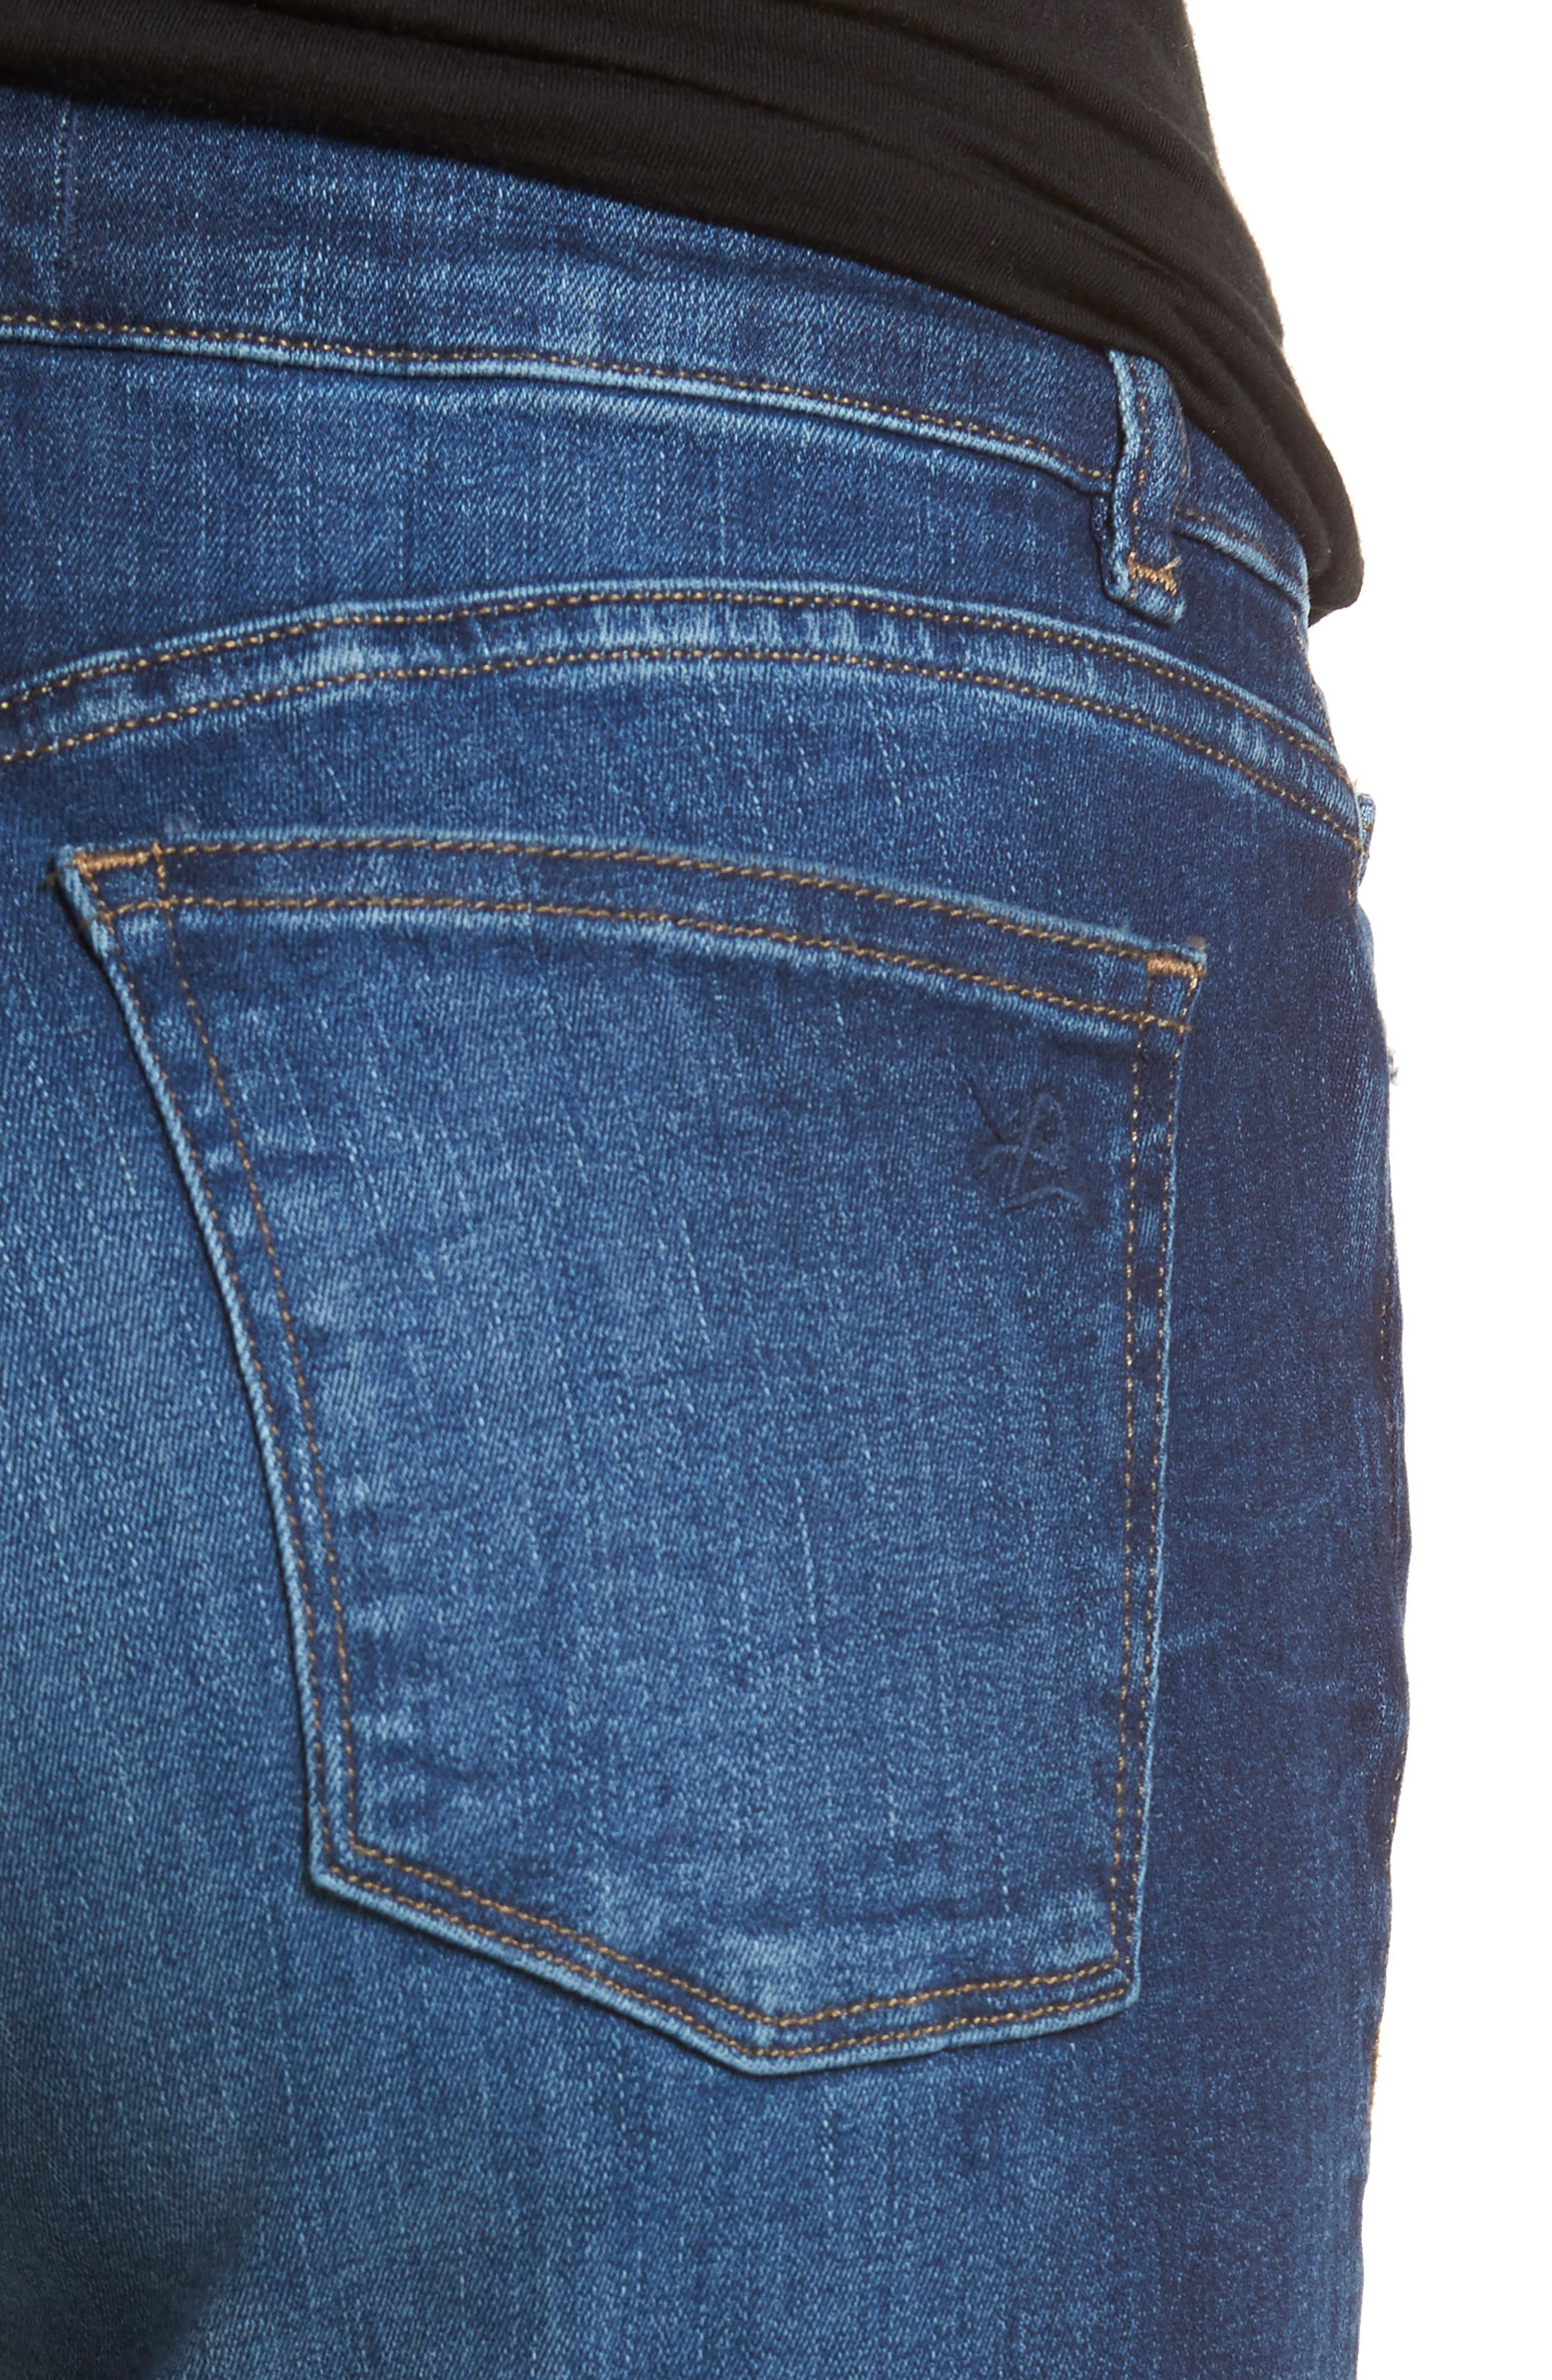 Coco Curvy Slim Straight Leg Jeans,                             Alternate thumbnail 4, color,                             405